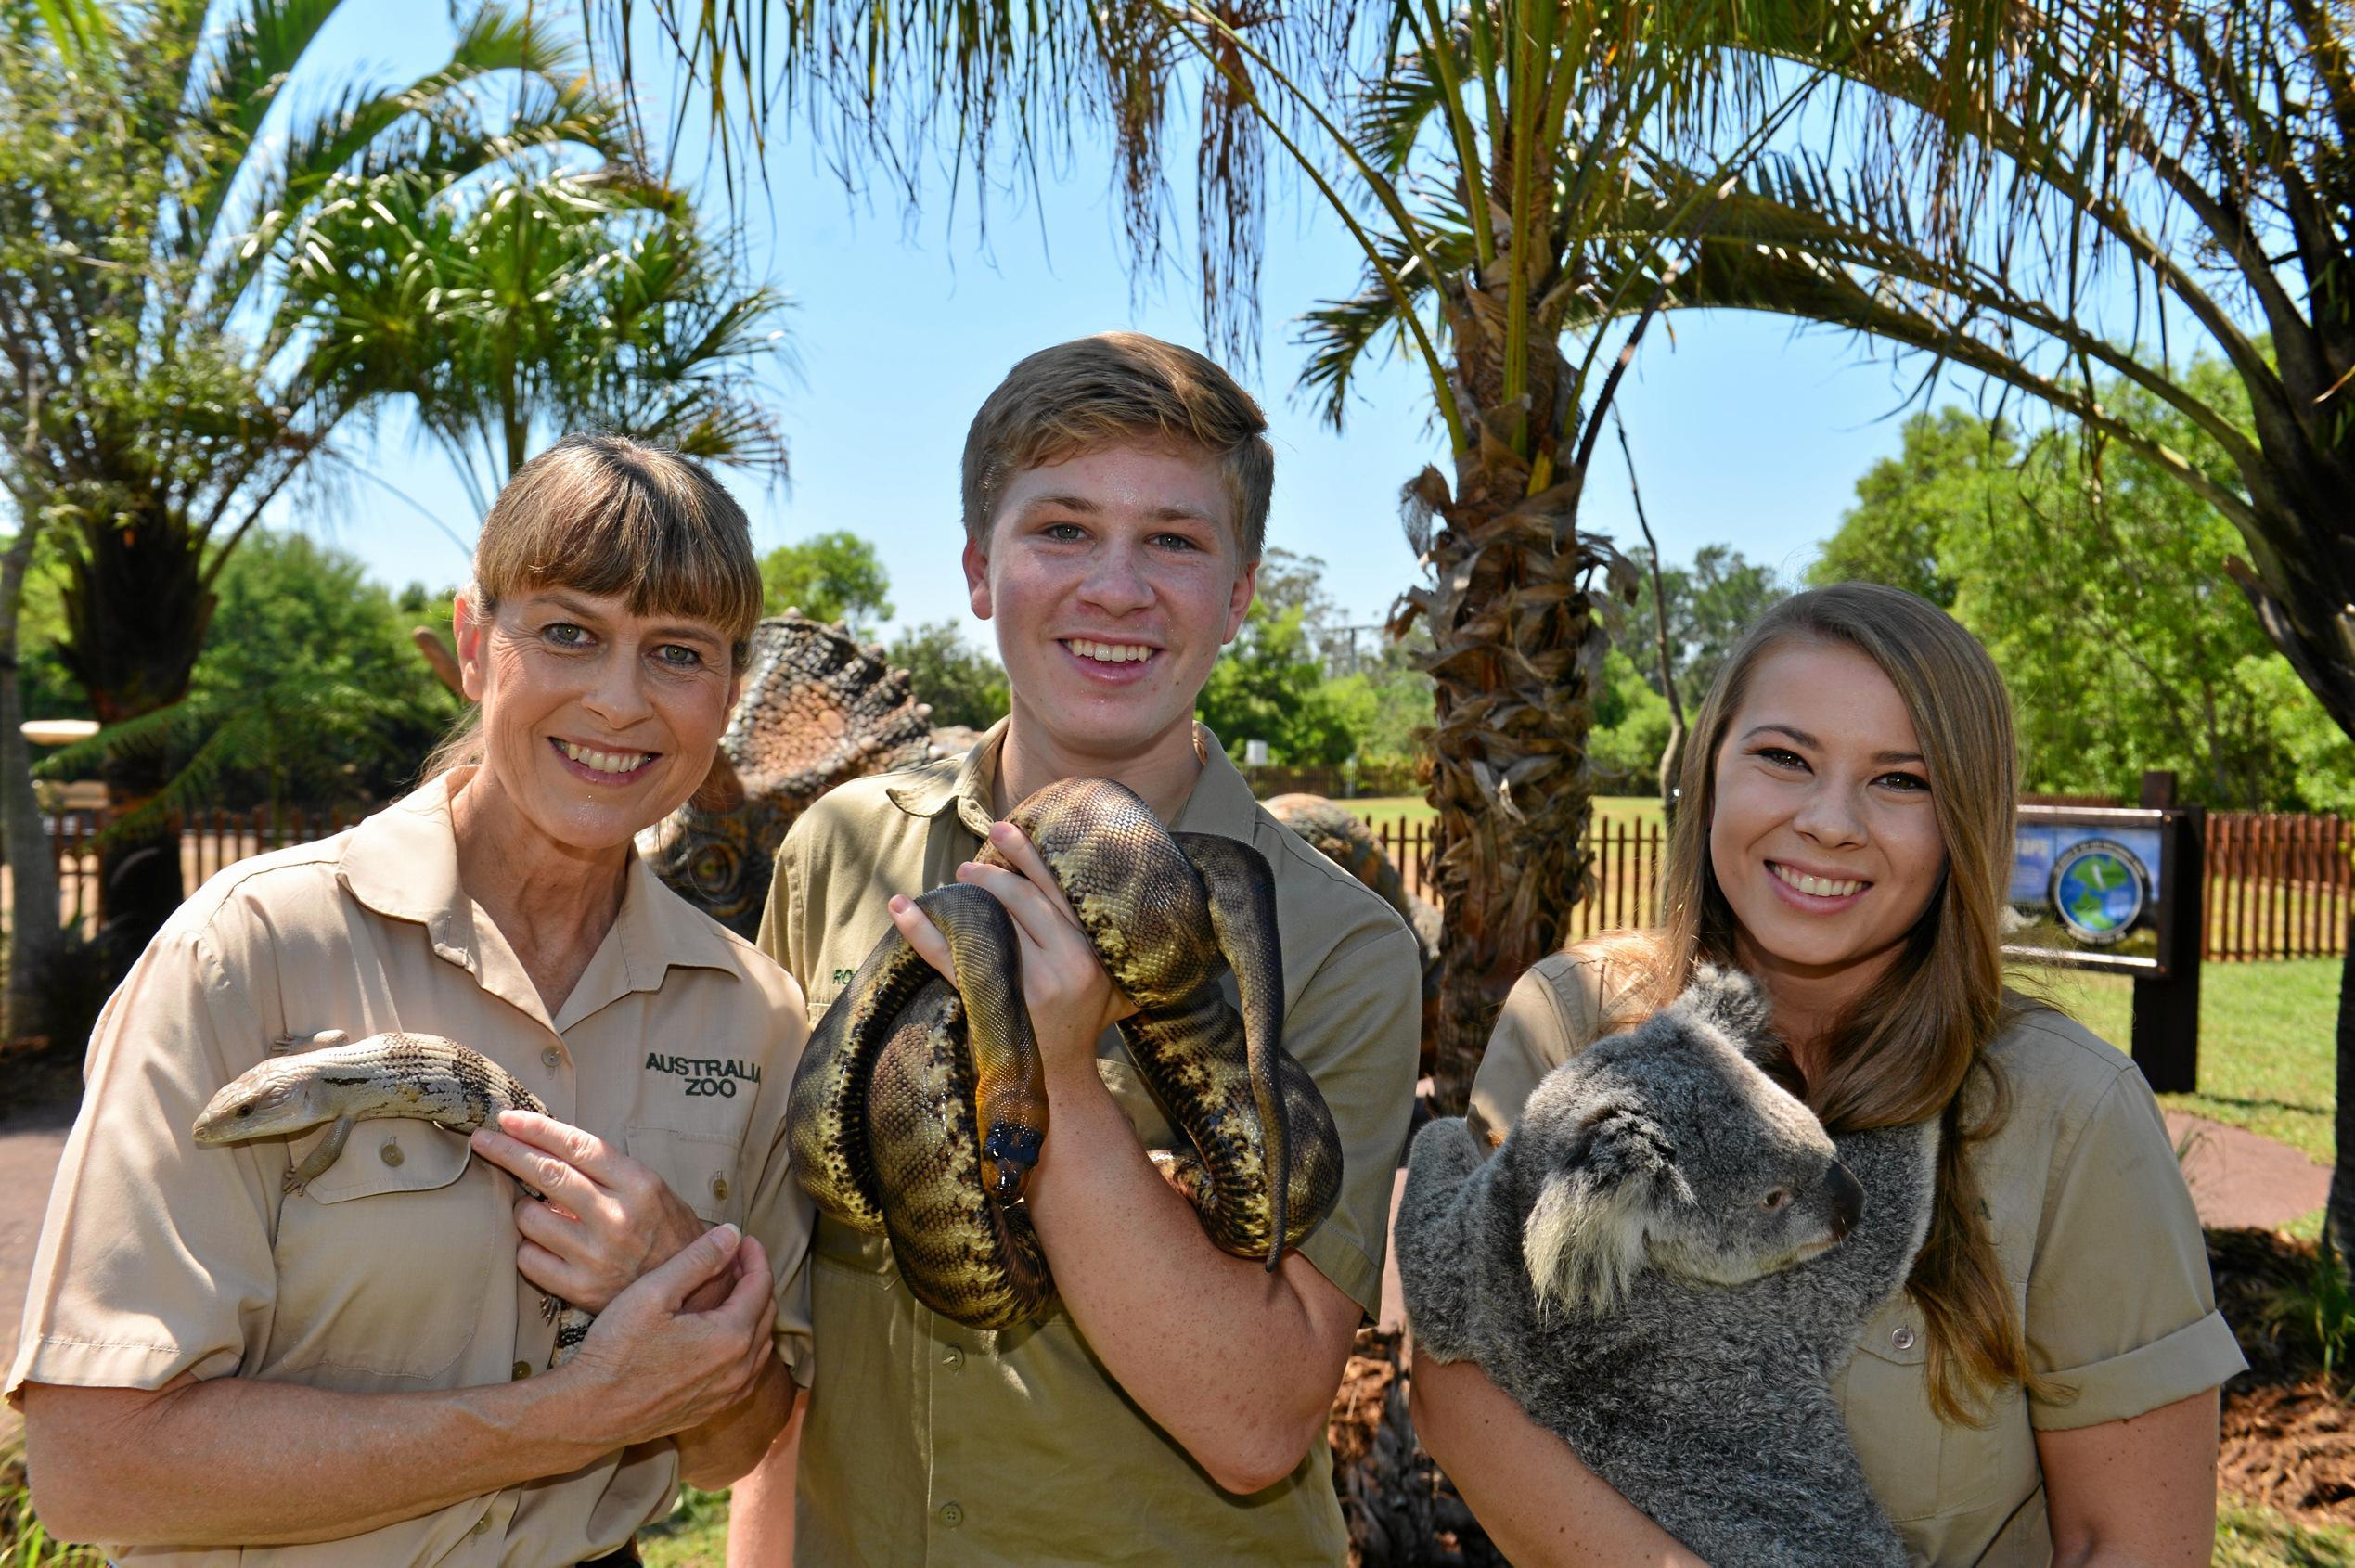 Irwin Family Honoured At Australian Tourism Awards Ceremony